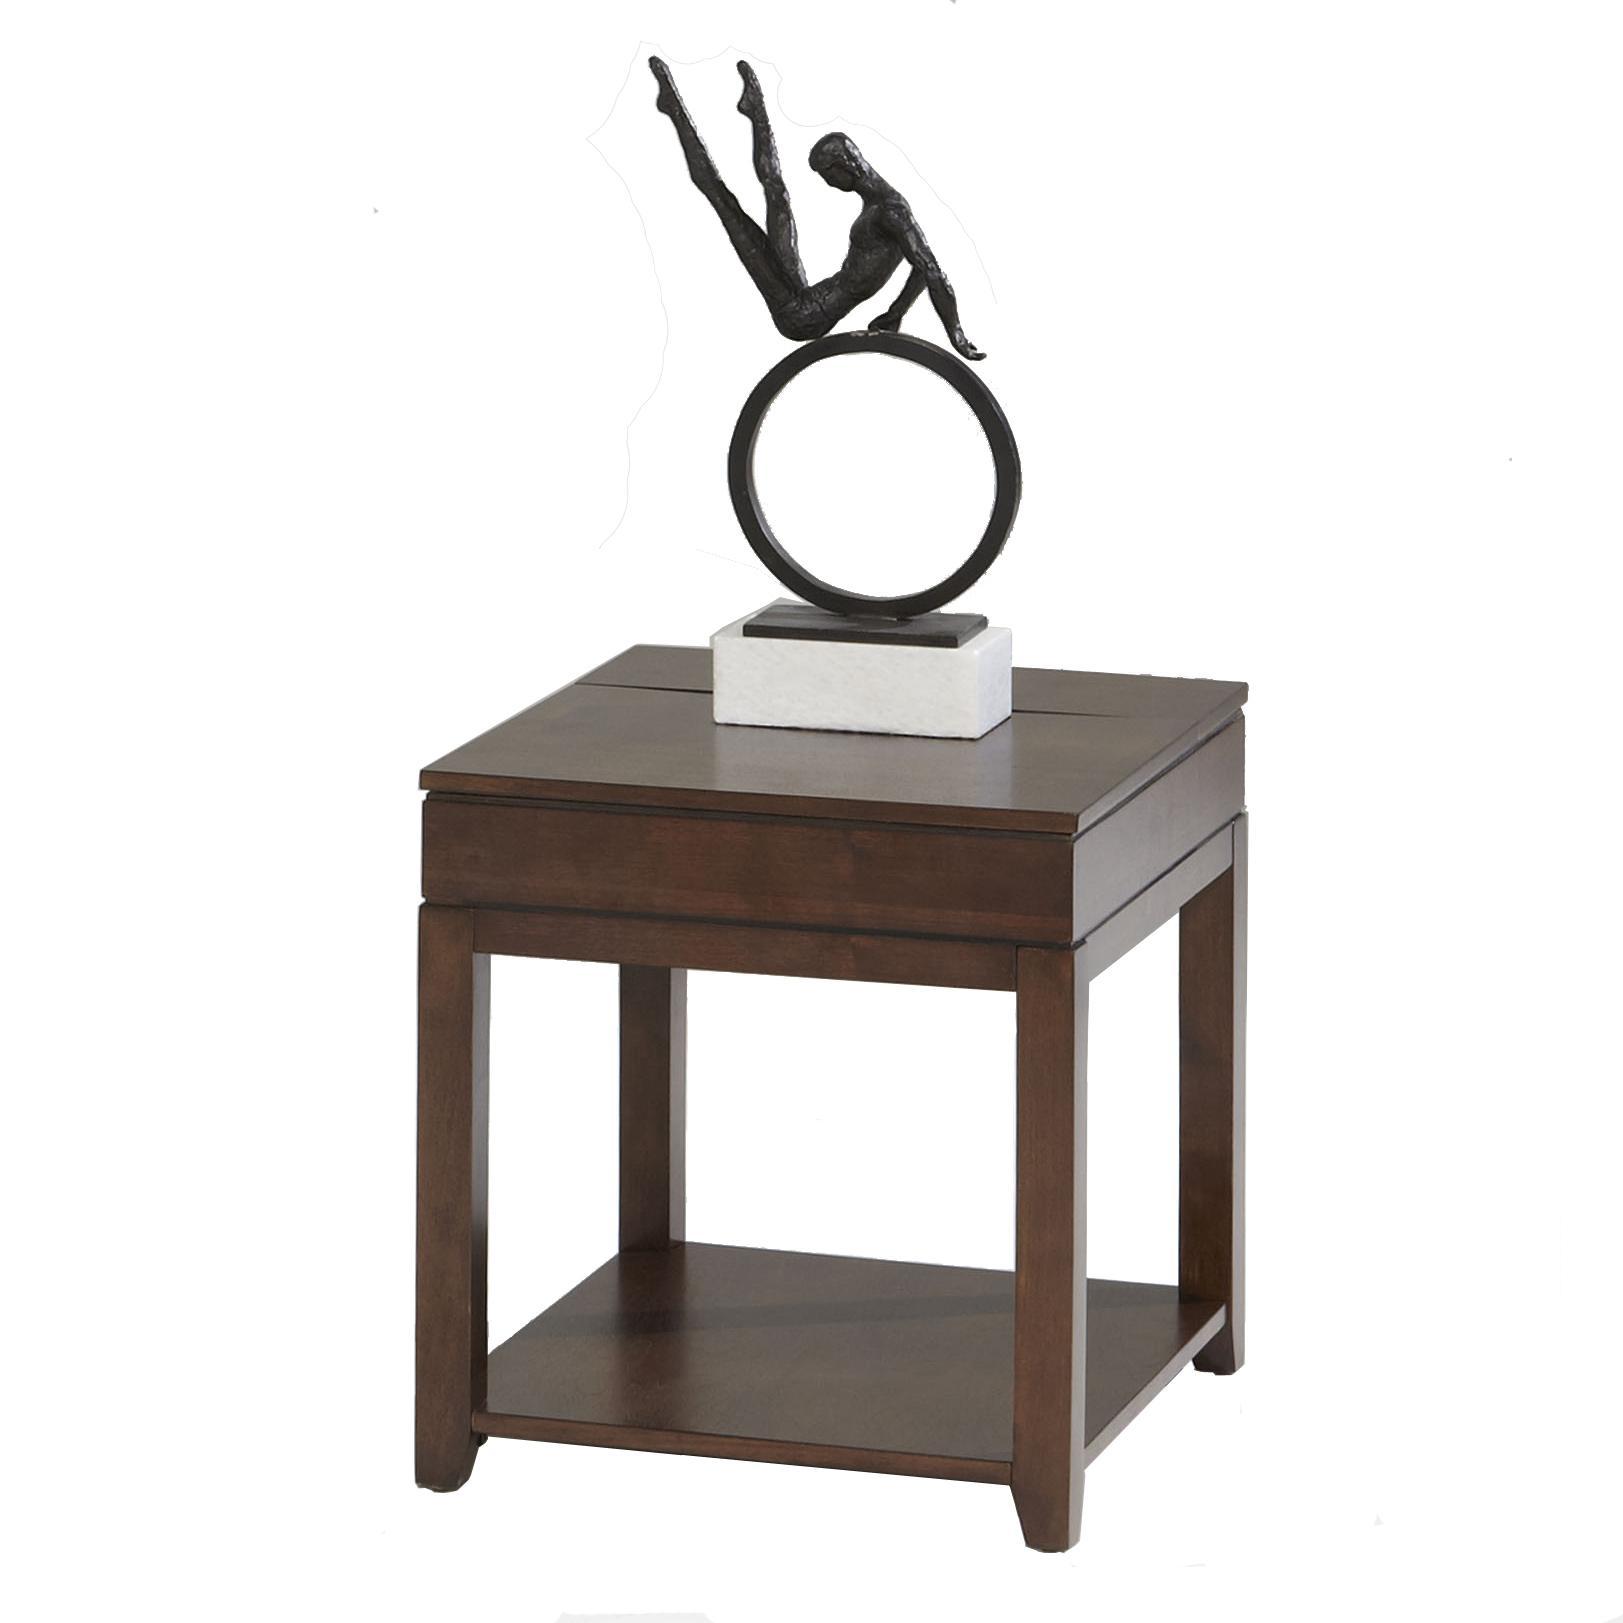 Progressive Furniture Daytona Rectangular End Table - Item Number: P531-04